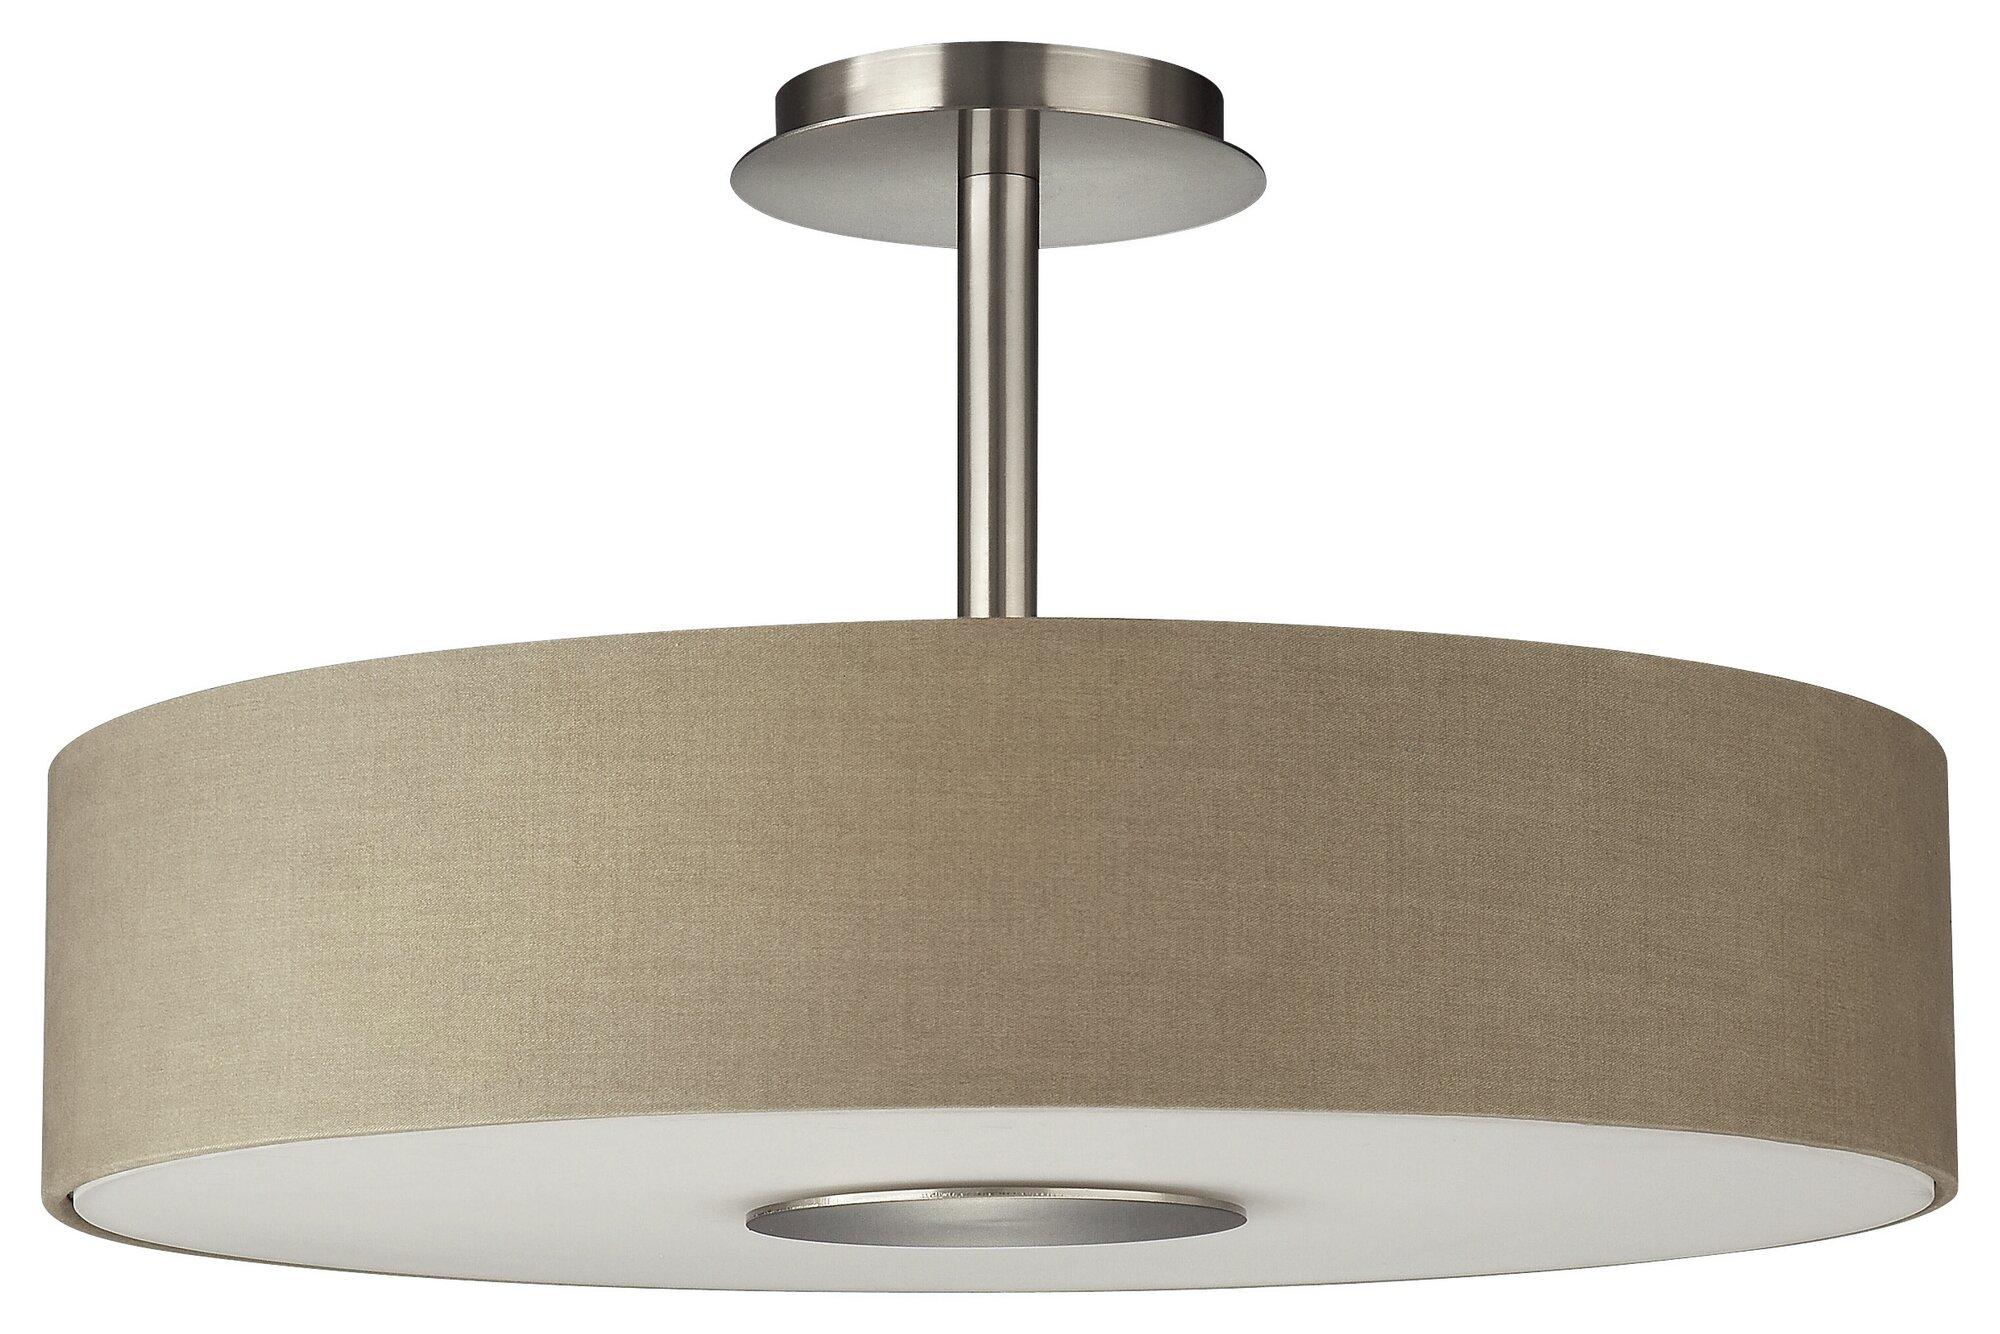 philips consumer luminaire dani 3 light semi flush mount ebay. Black Bedroom Furniture Sets. Home Design Ideas